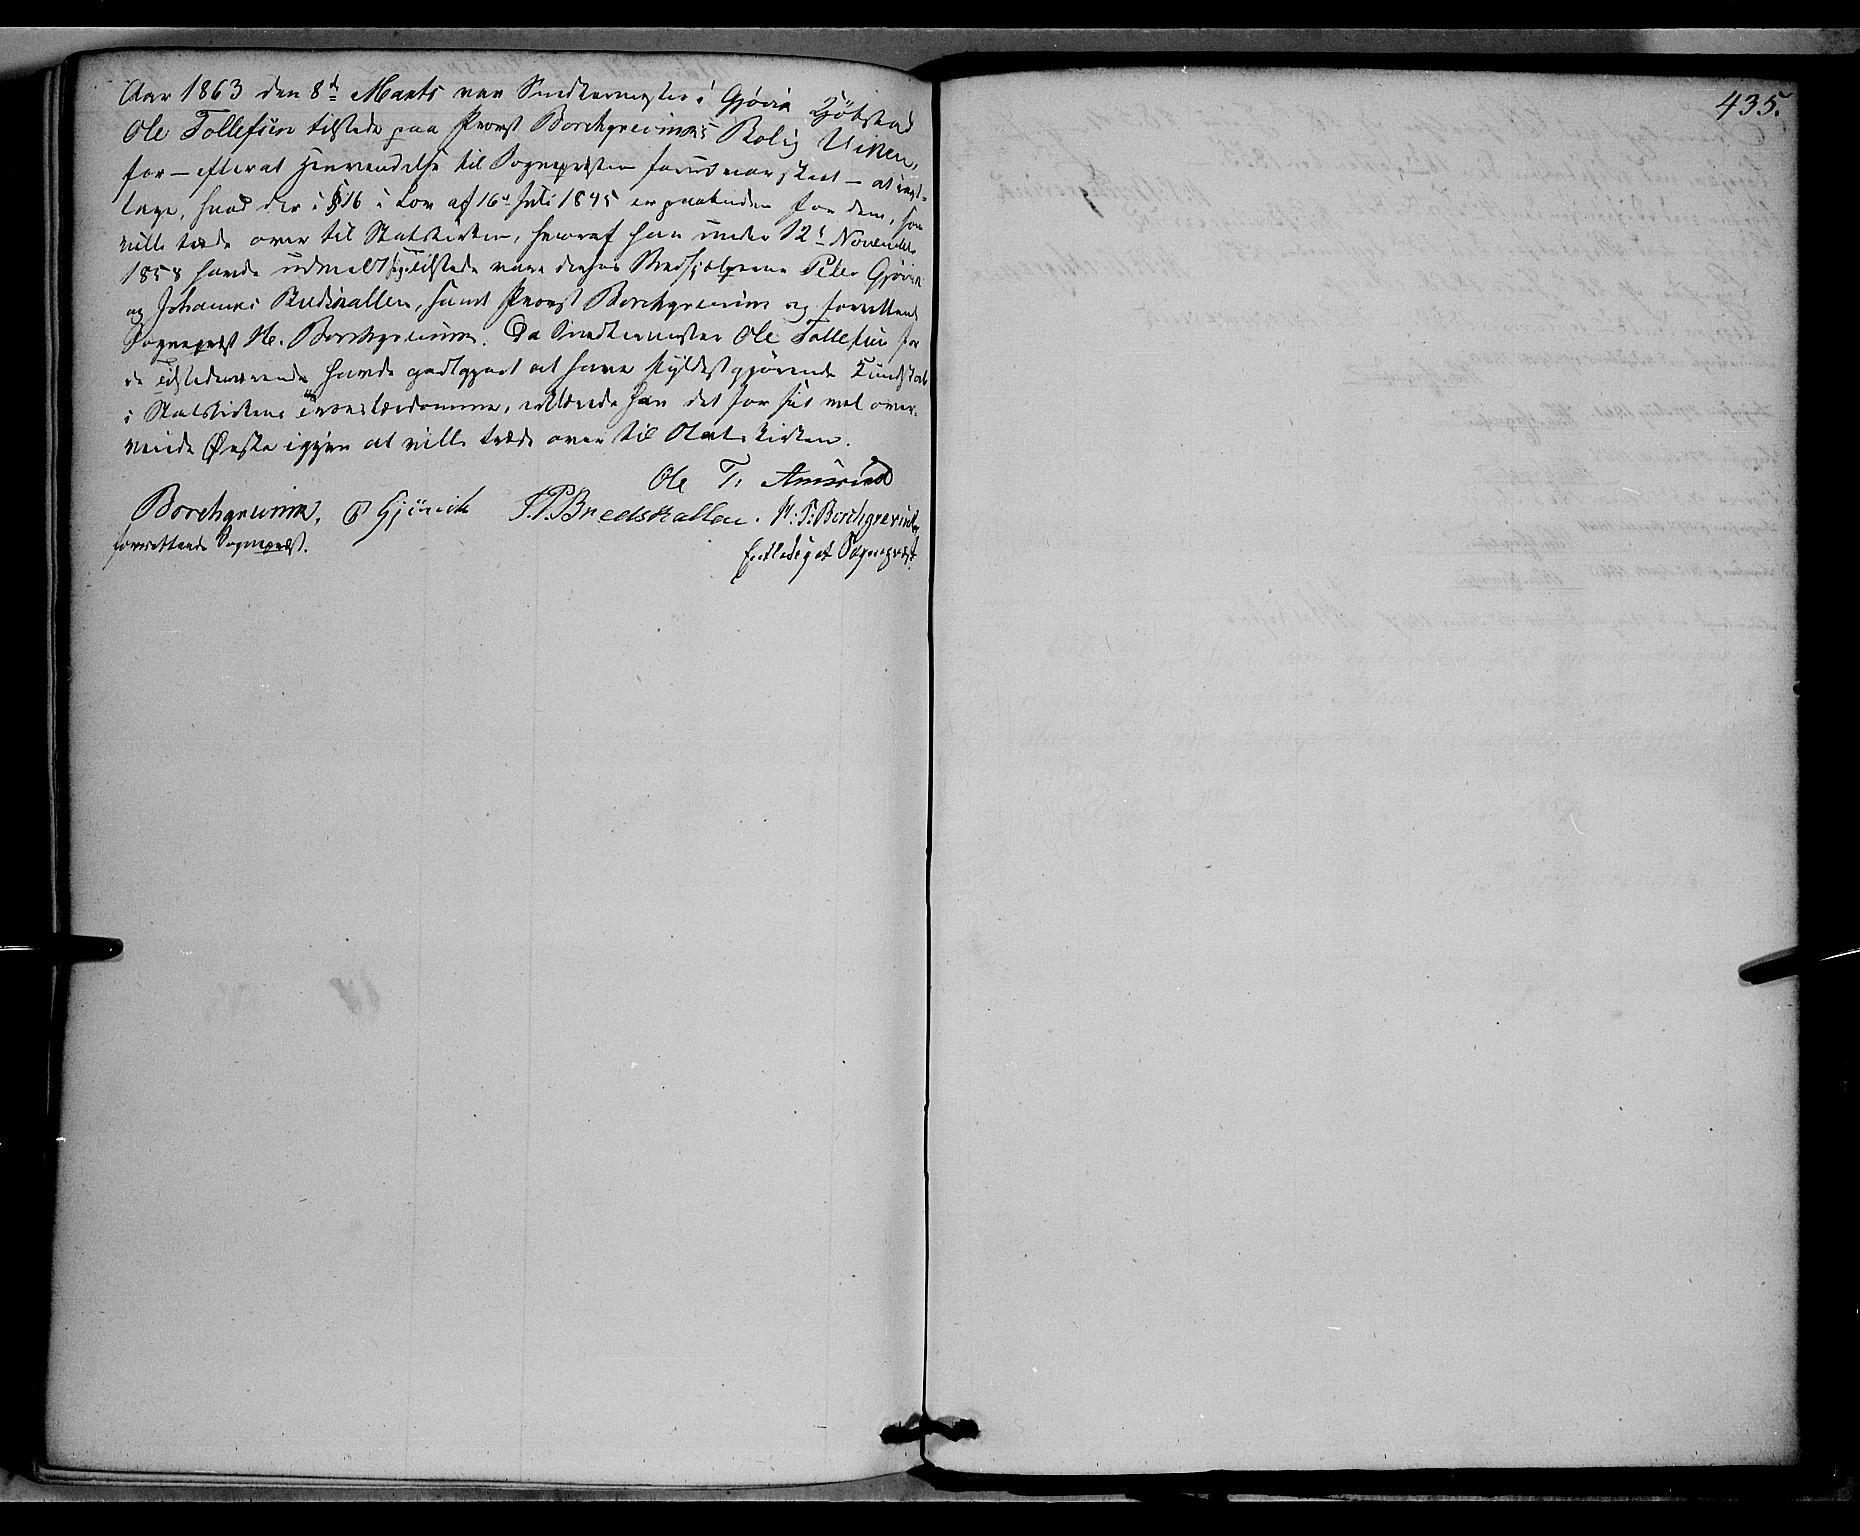 SAH, Vardal prestekontor, H/Ha/Haa/L0006: Ministerialbok nr. 6, 1854-1866, s. 435